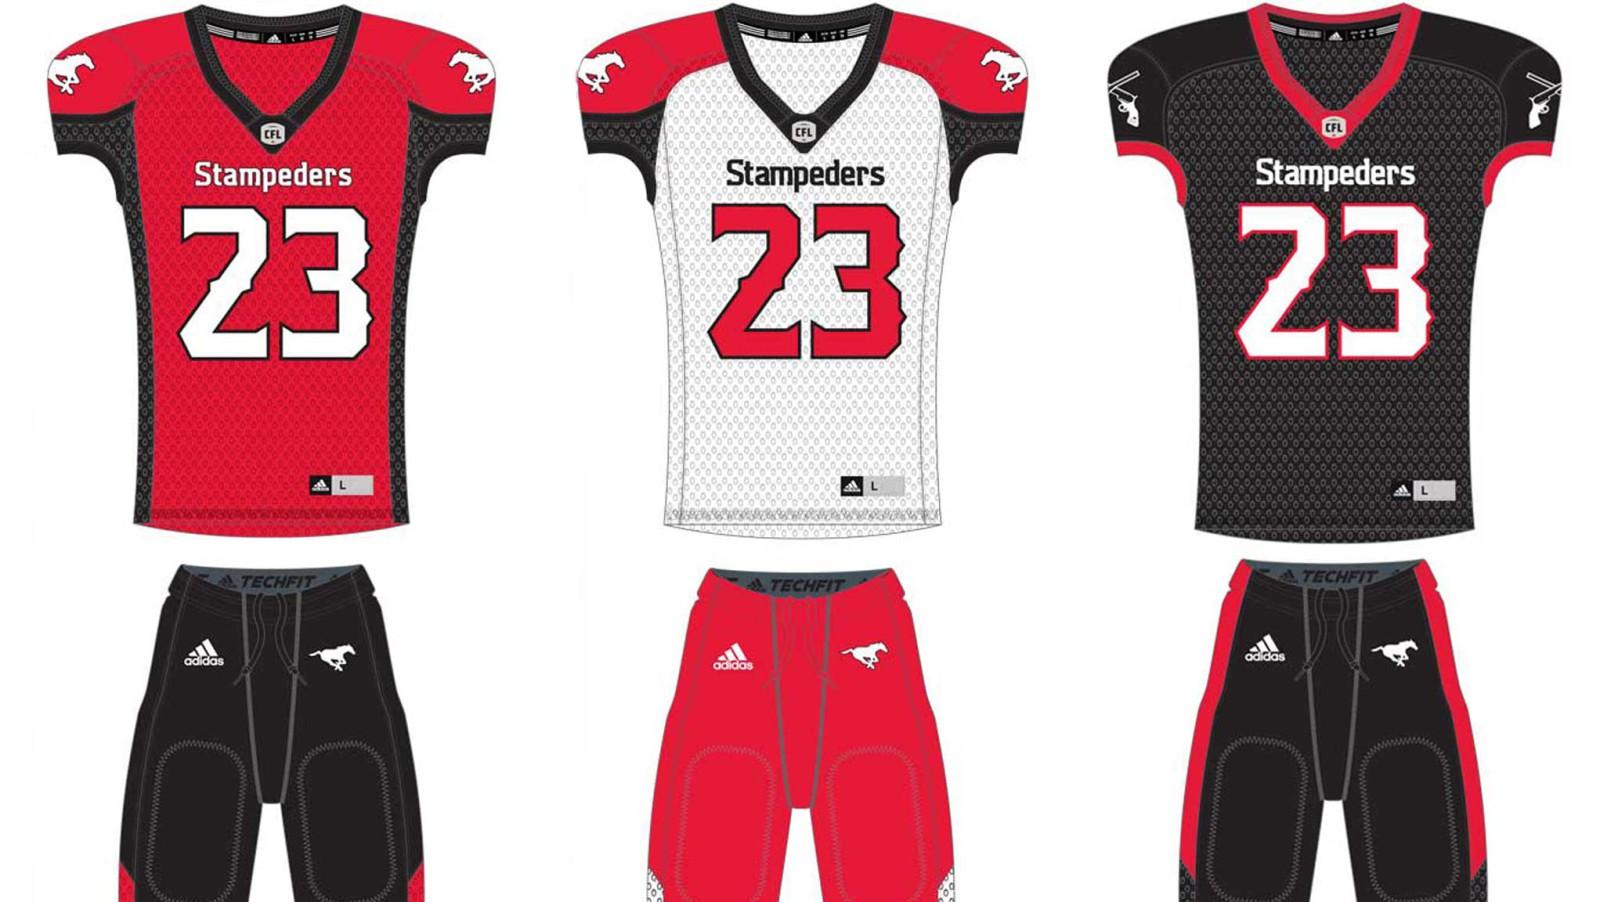 Stampeders unveil new adidas uniforms